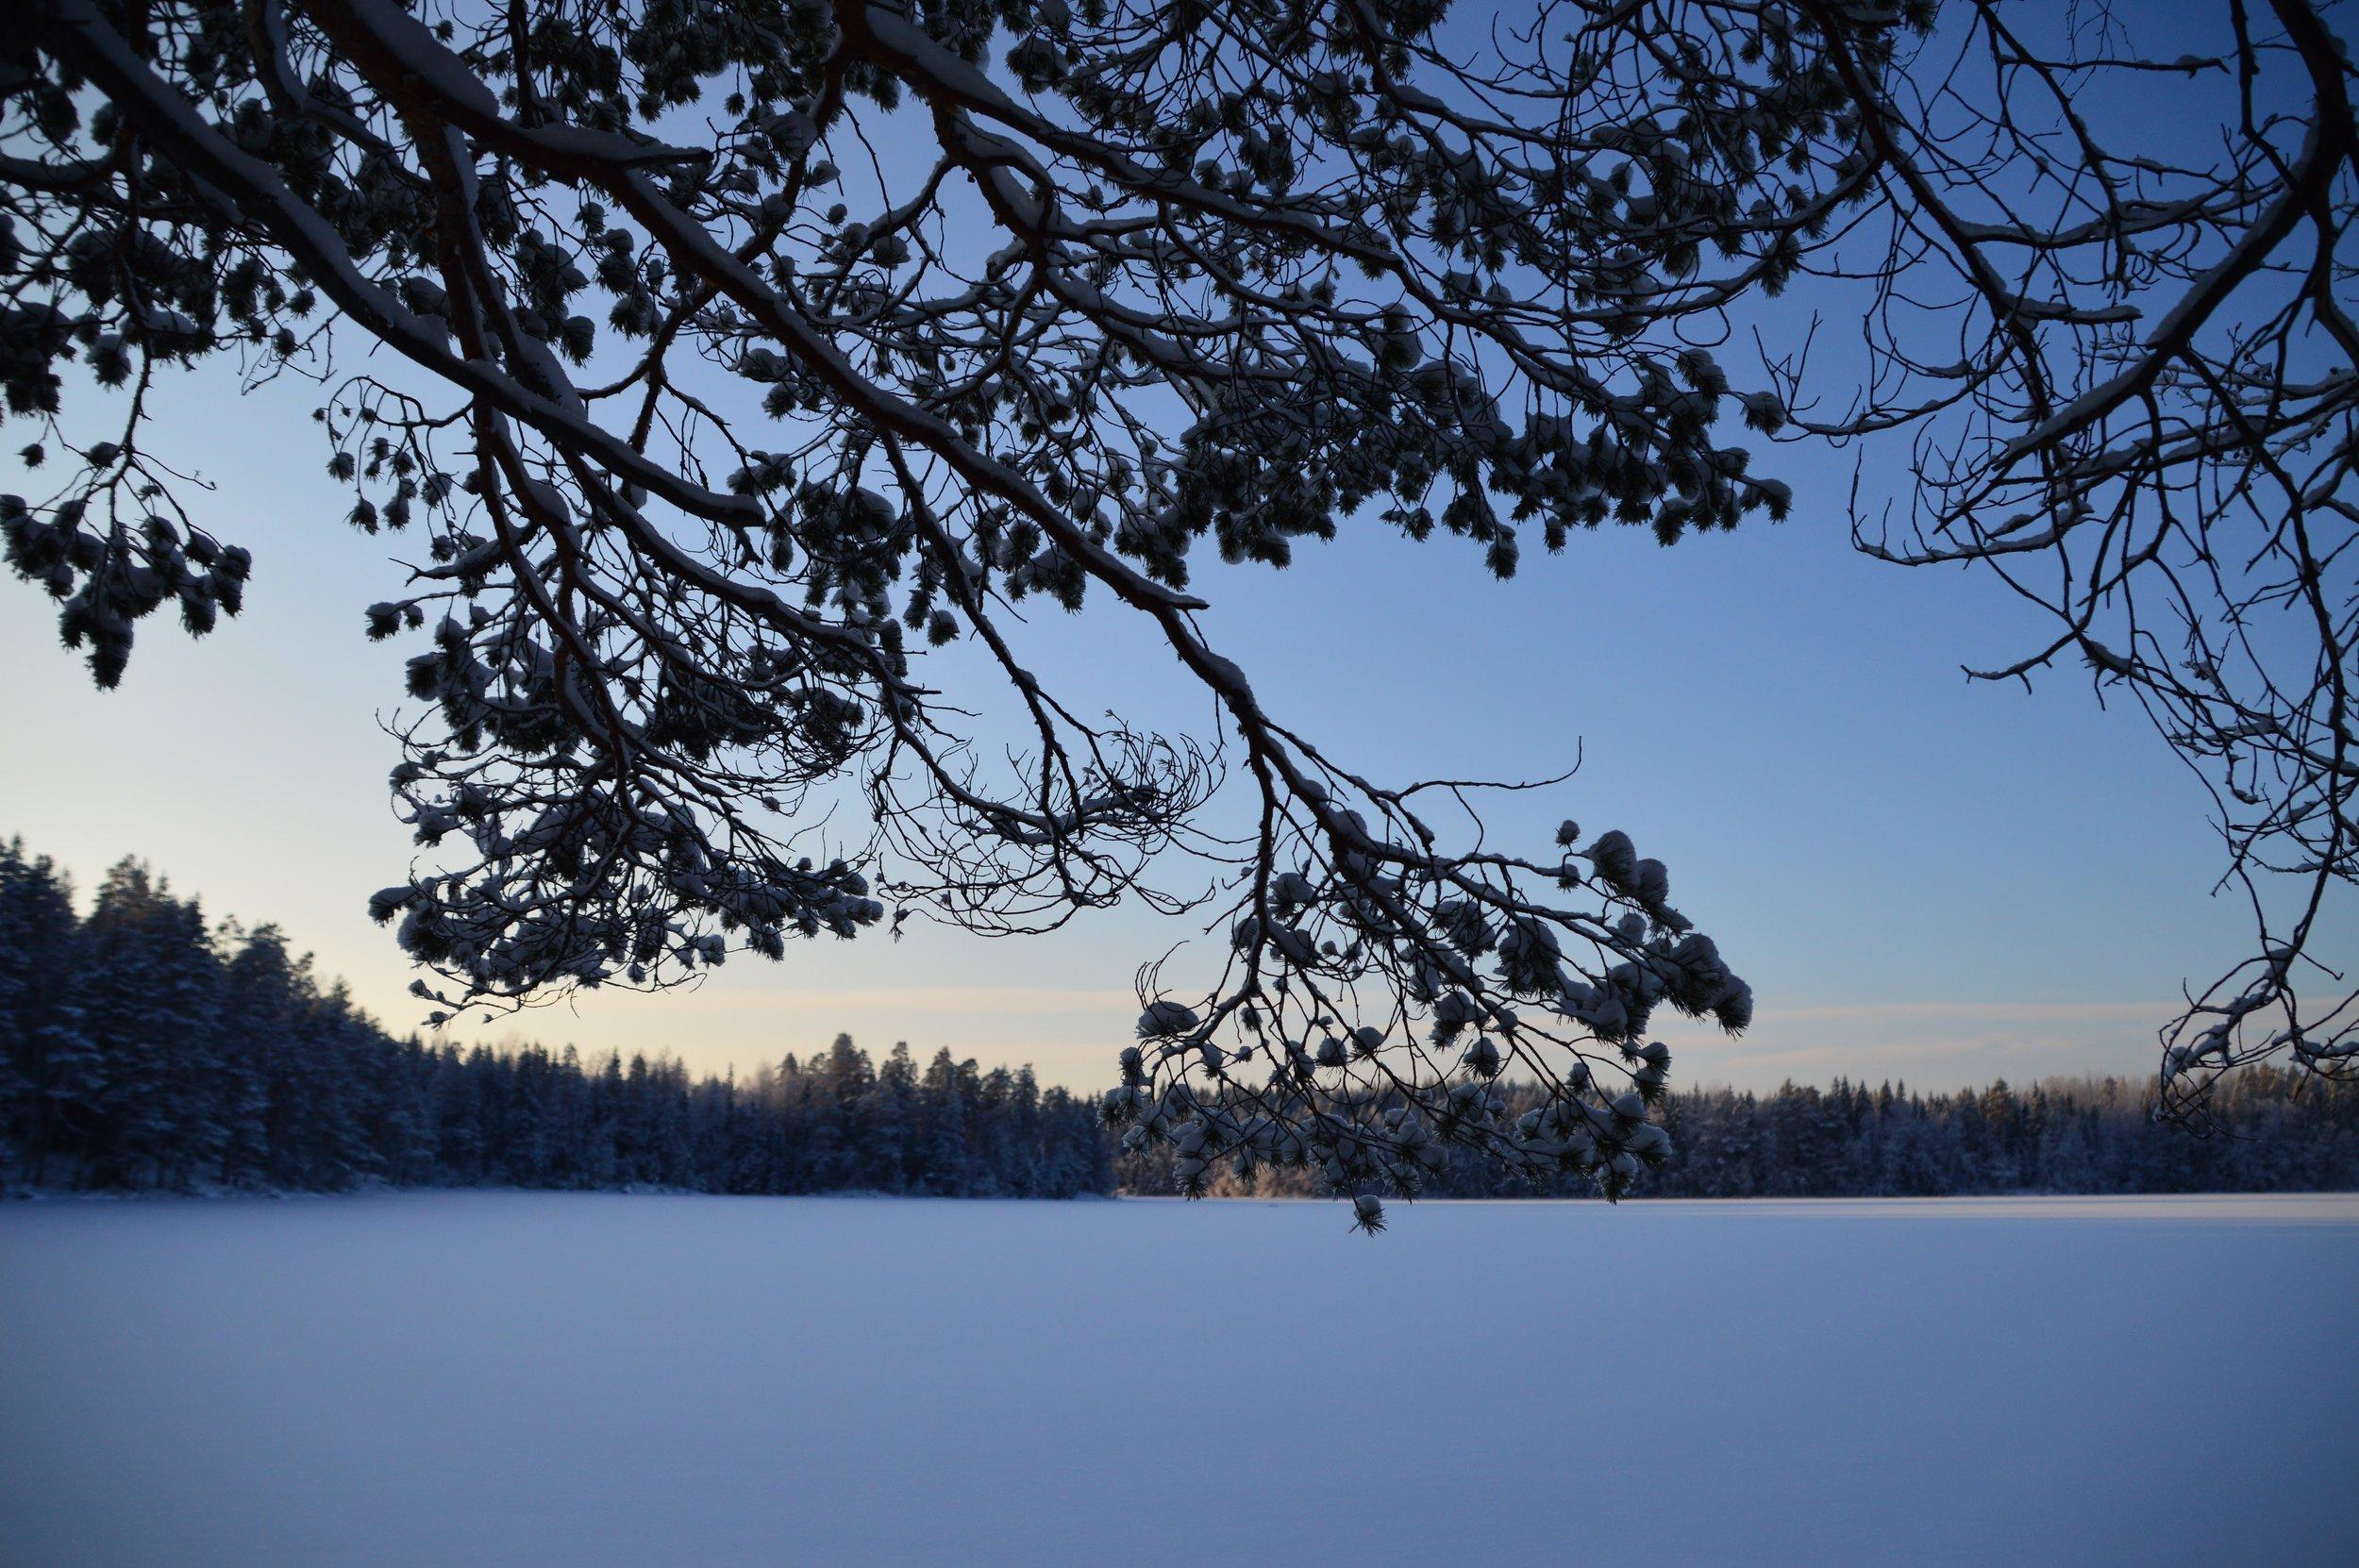 ice-fishing-in-finland.JPG